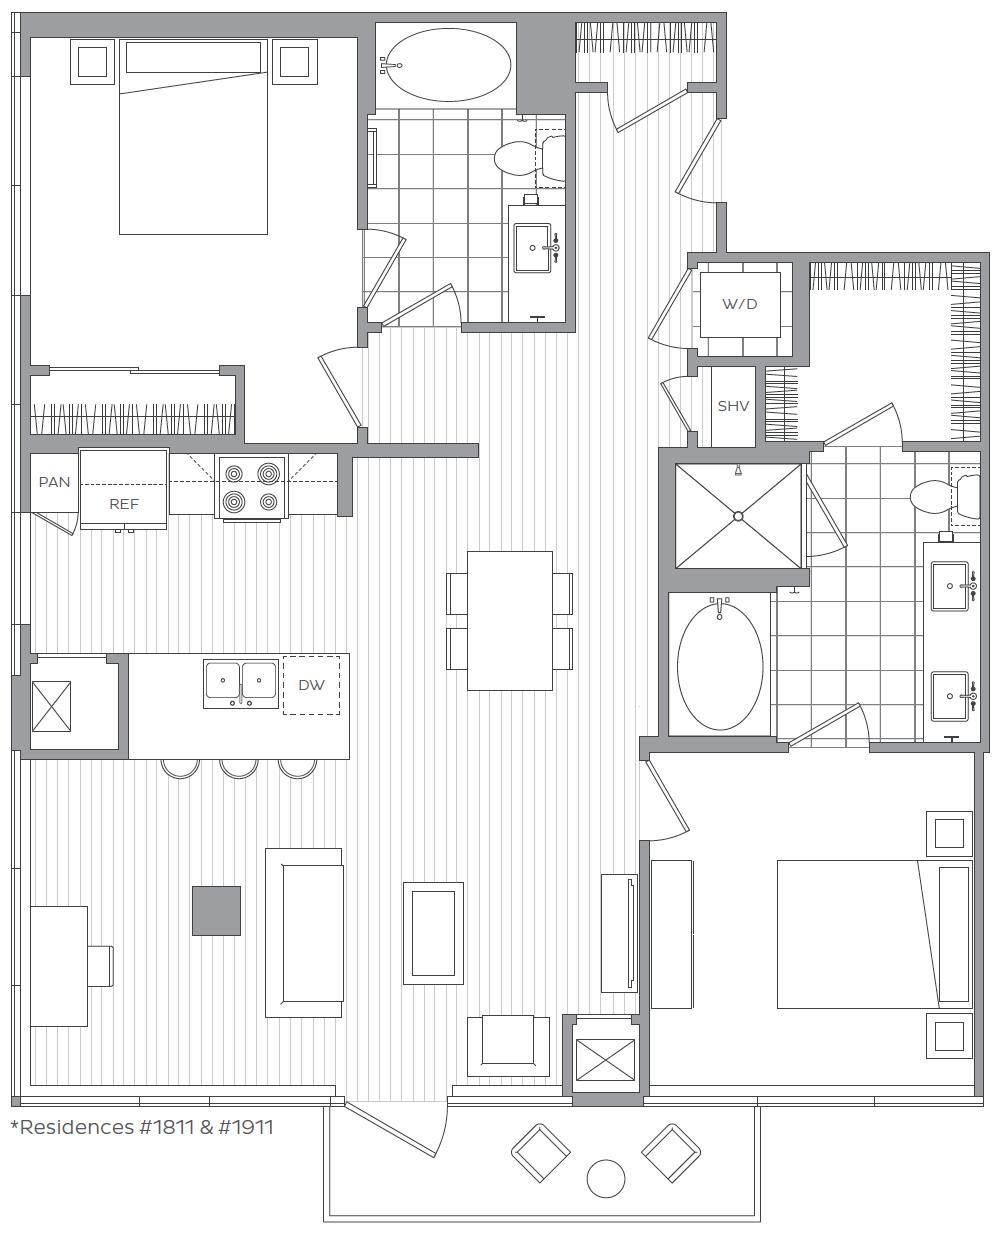 W - 2 Bedroom  / 2 Bath